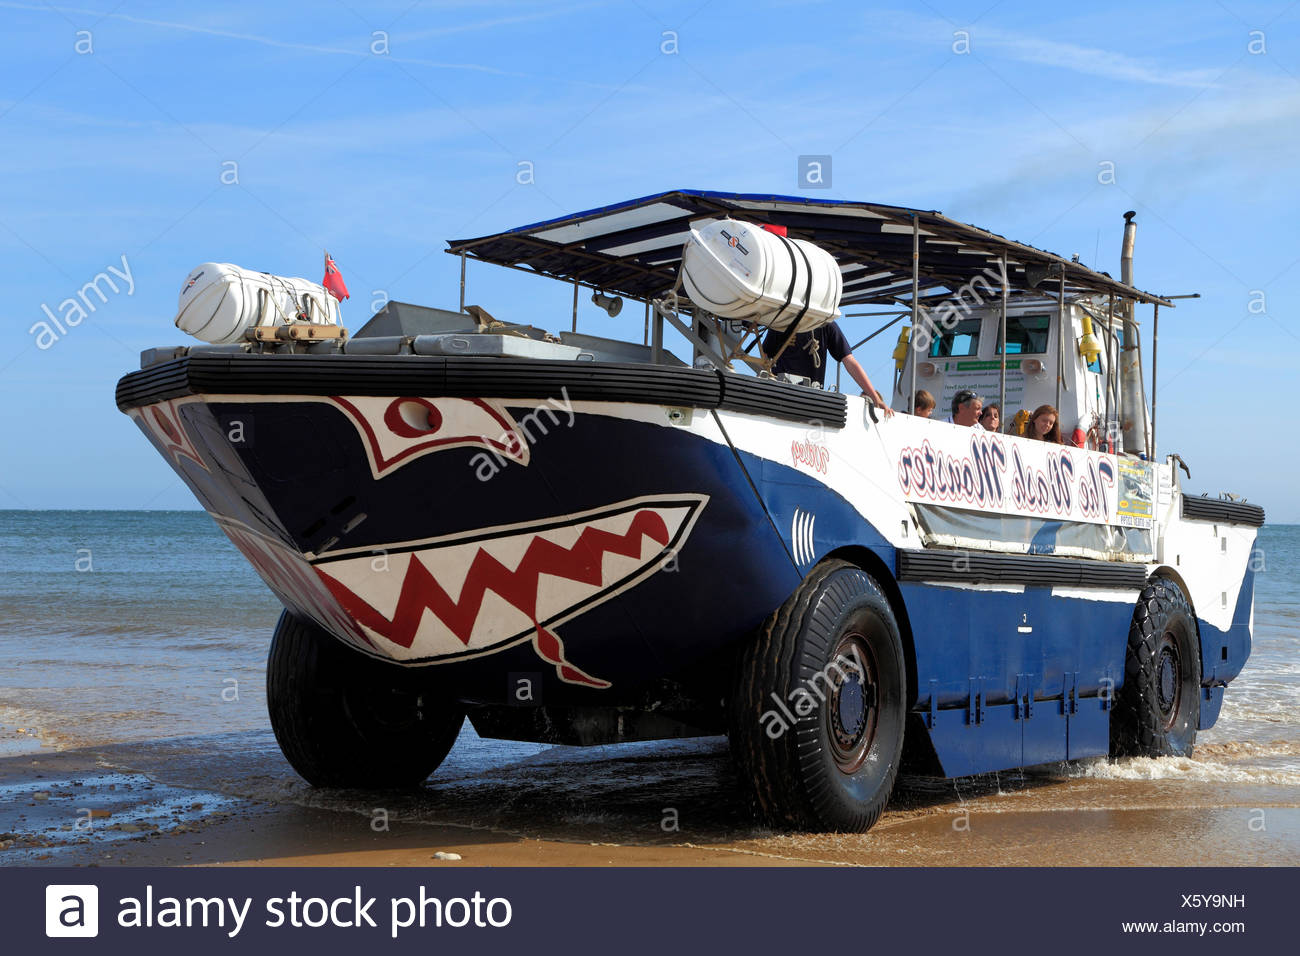 The Wash Monster, pleasure craft, Hunstanton beach, Norfolk, England, UK - Stock Image